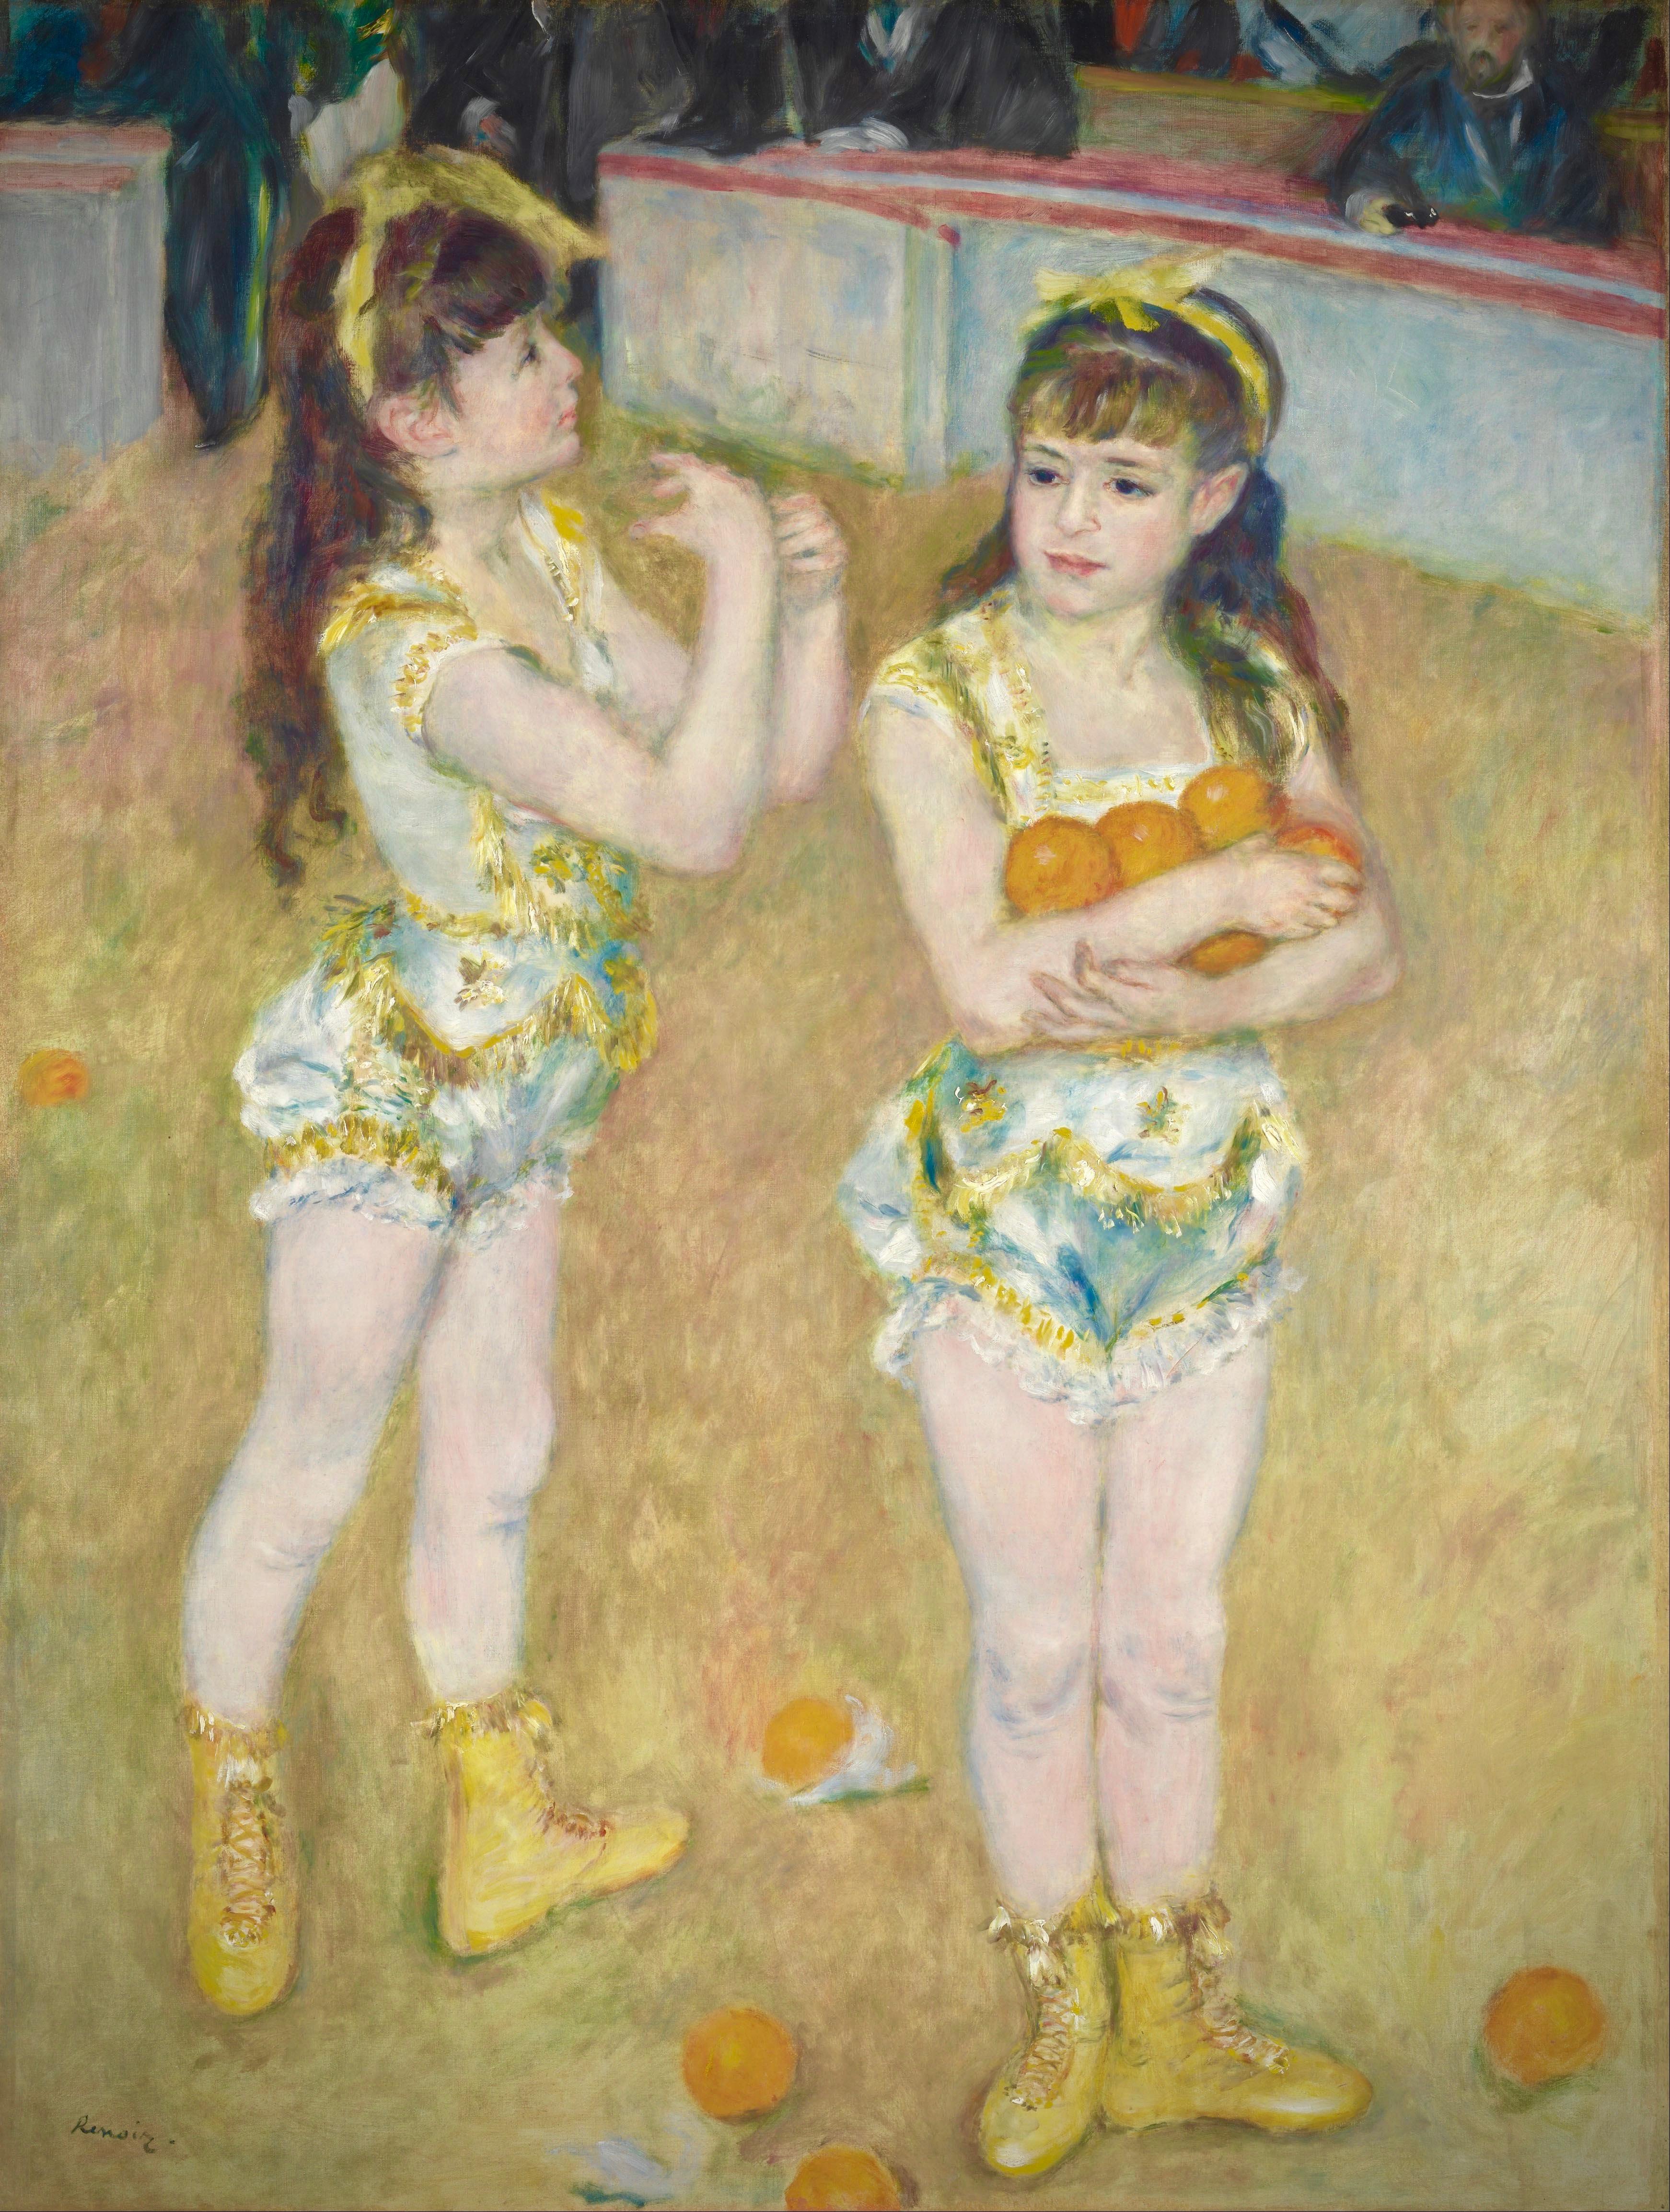 pierre-auguste_renoir_-_acrobats_at_the_cirque_fernando_francisca_and_angelina_wartenberg_-_google_art_project